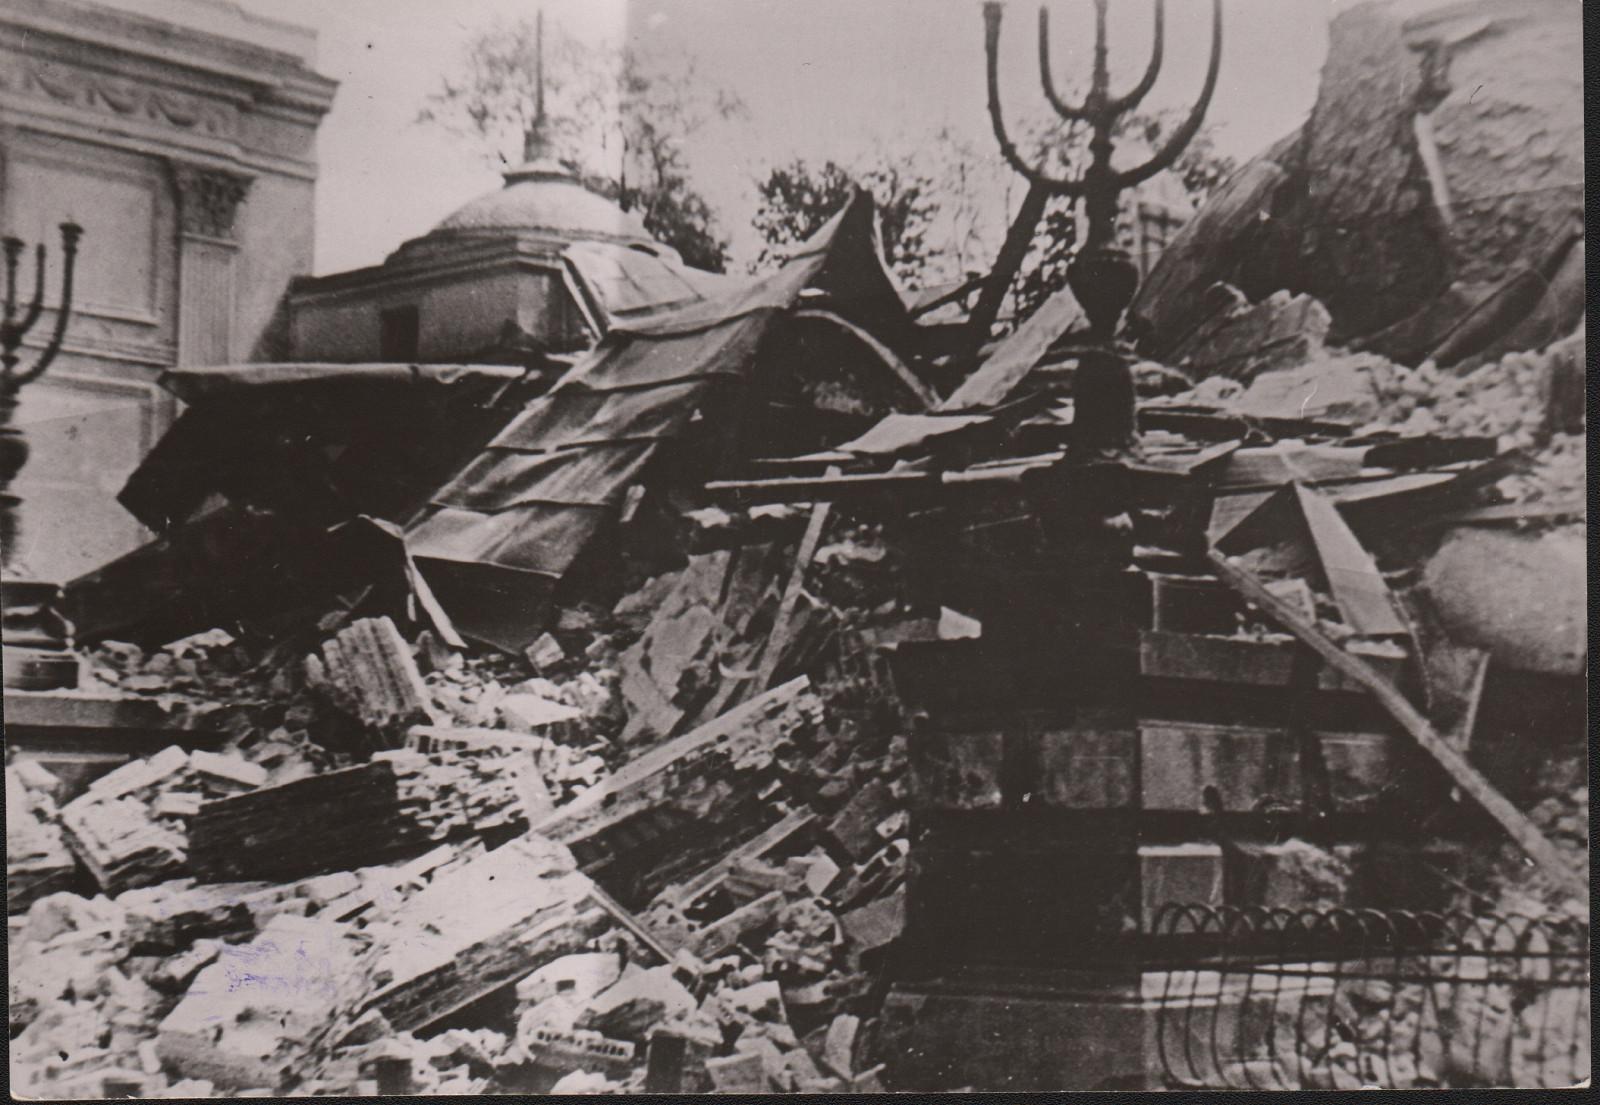 8._Ruiny_Wielkiej_Synagogi_po_16.05.1943r_001.jpg